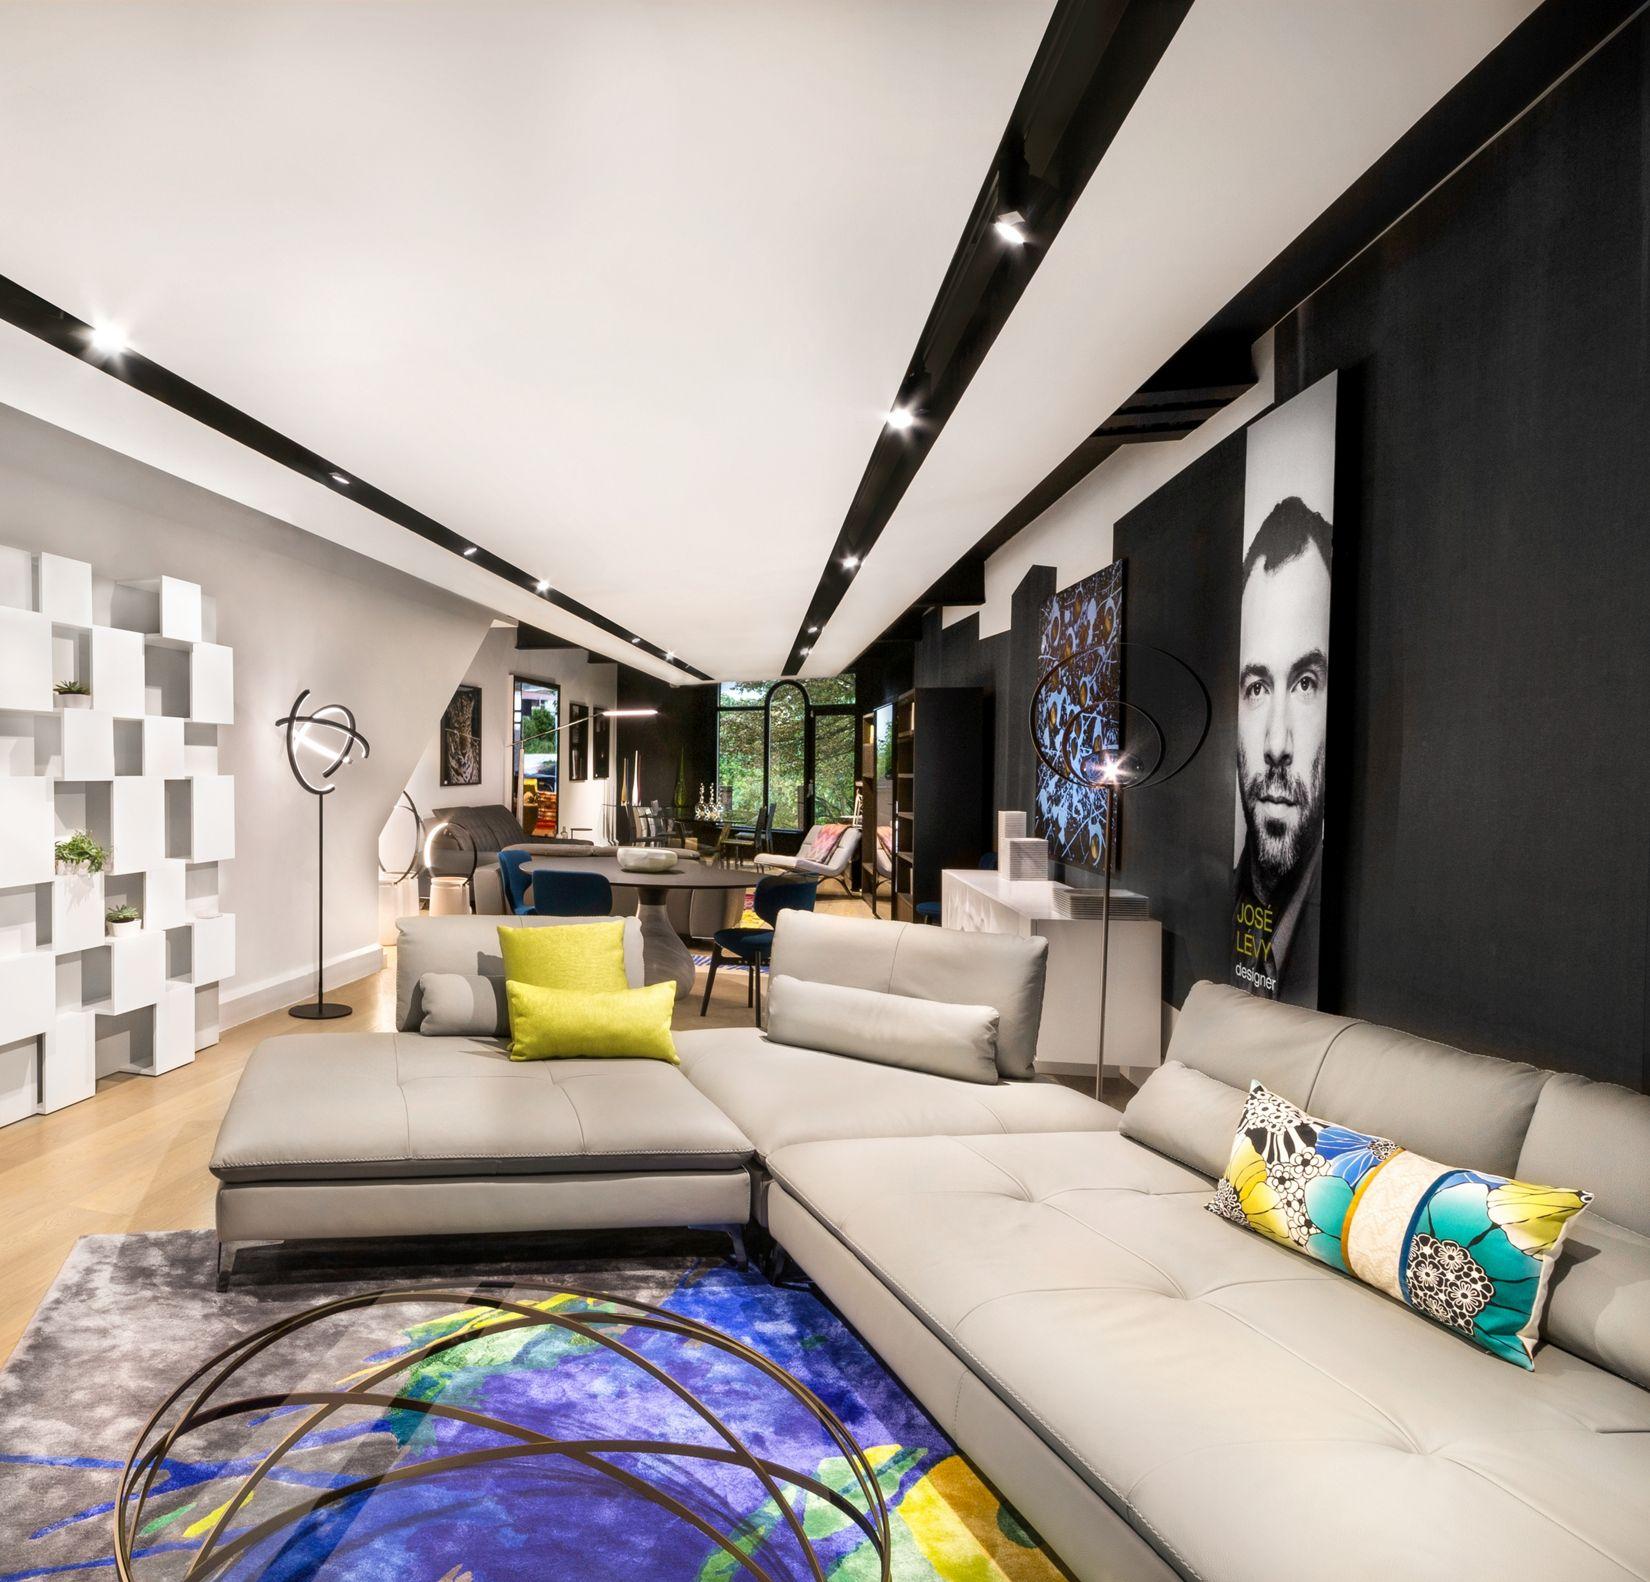 magasin roche bobois london hampstead 1 nw3 6hj. Black Bedroom Furniture Sets. Home Design Ideas